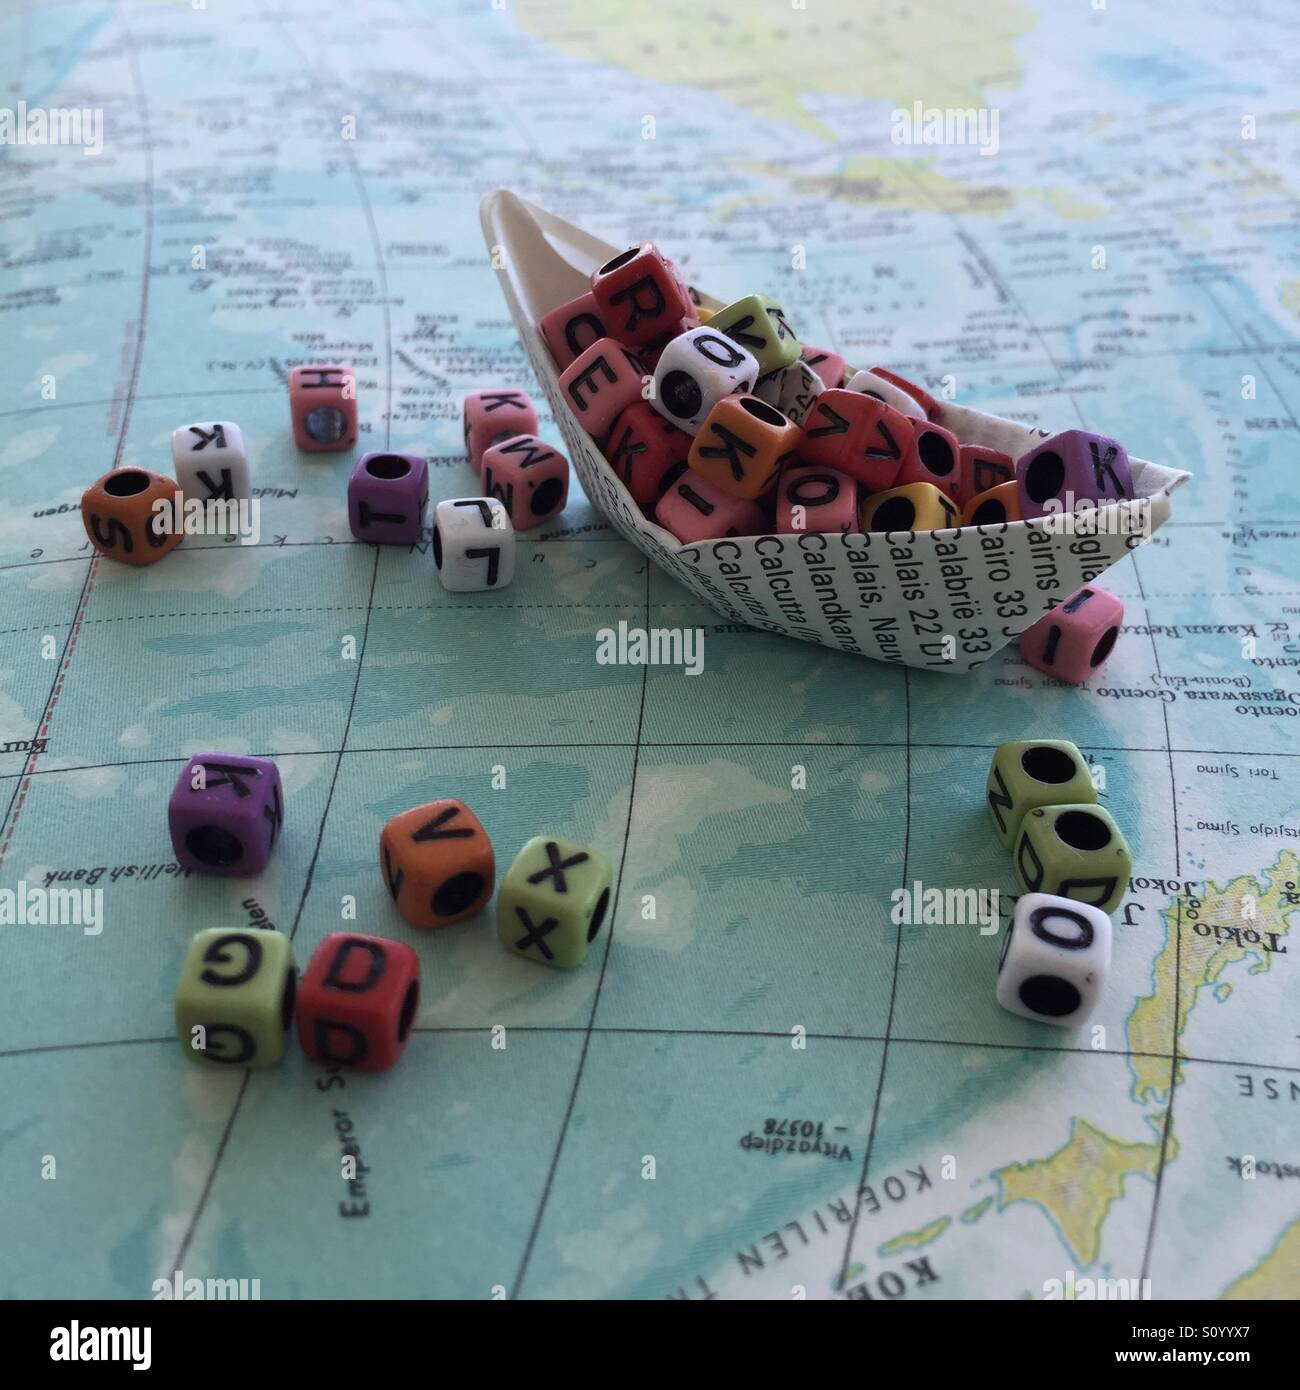 Lost at sea - Stock Image